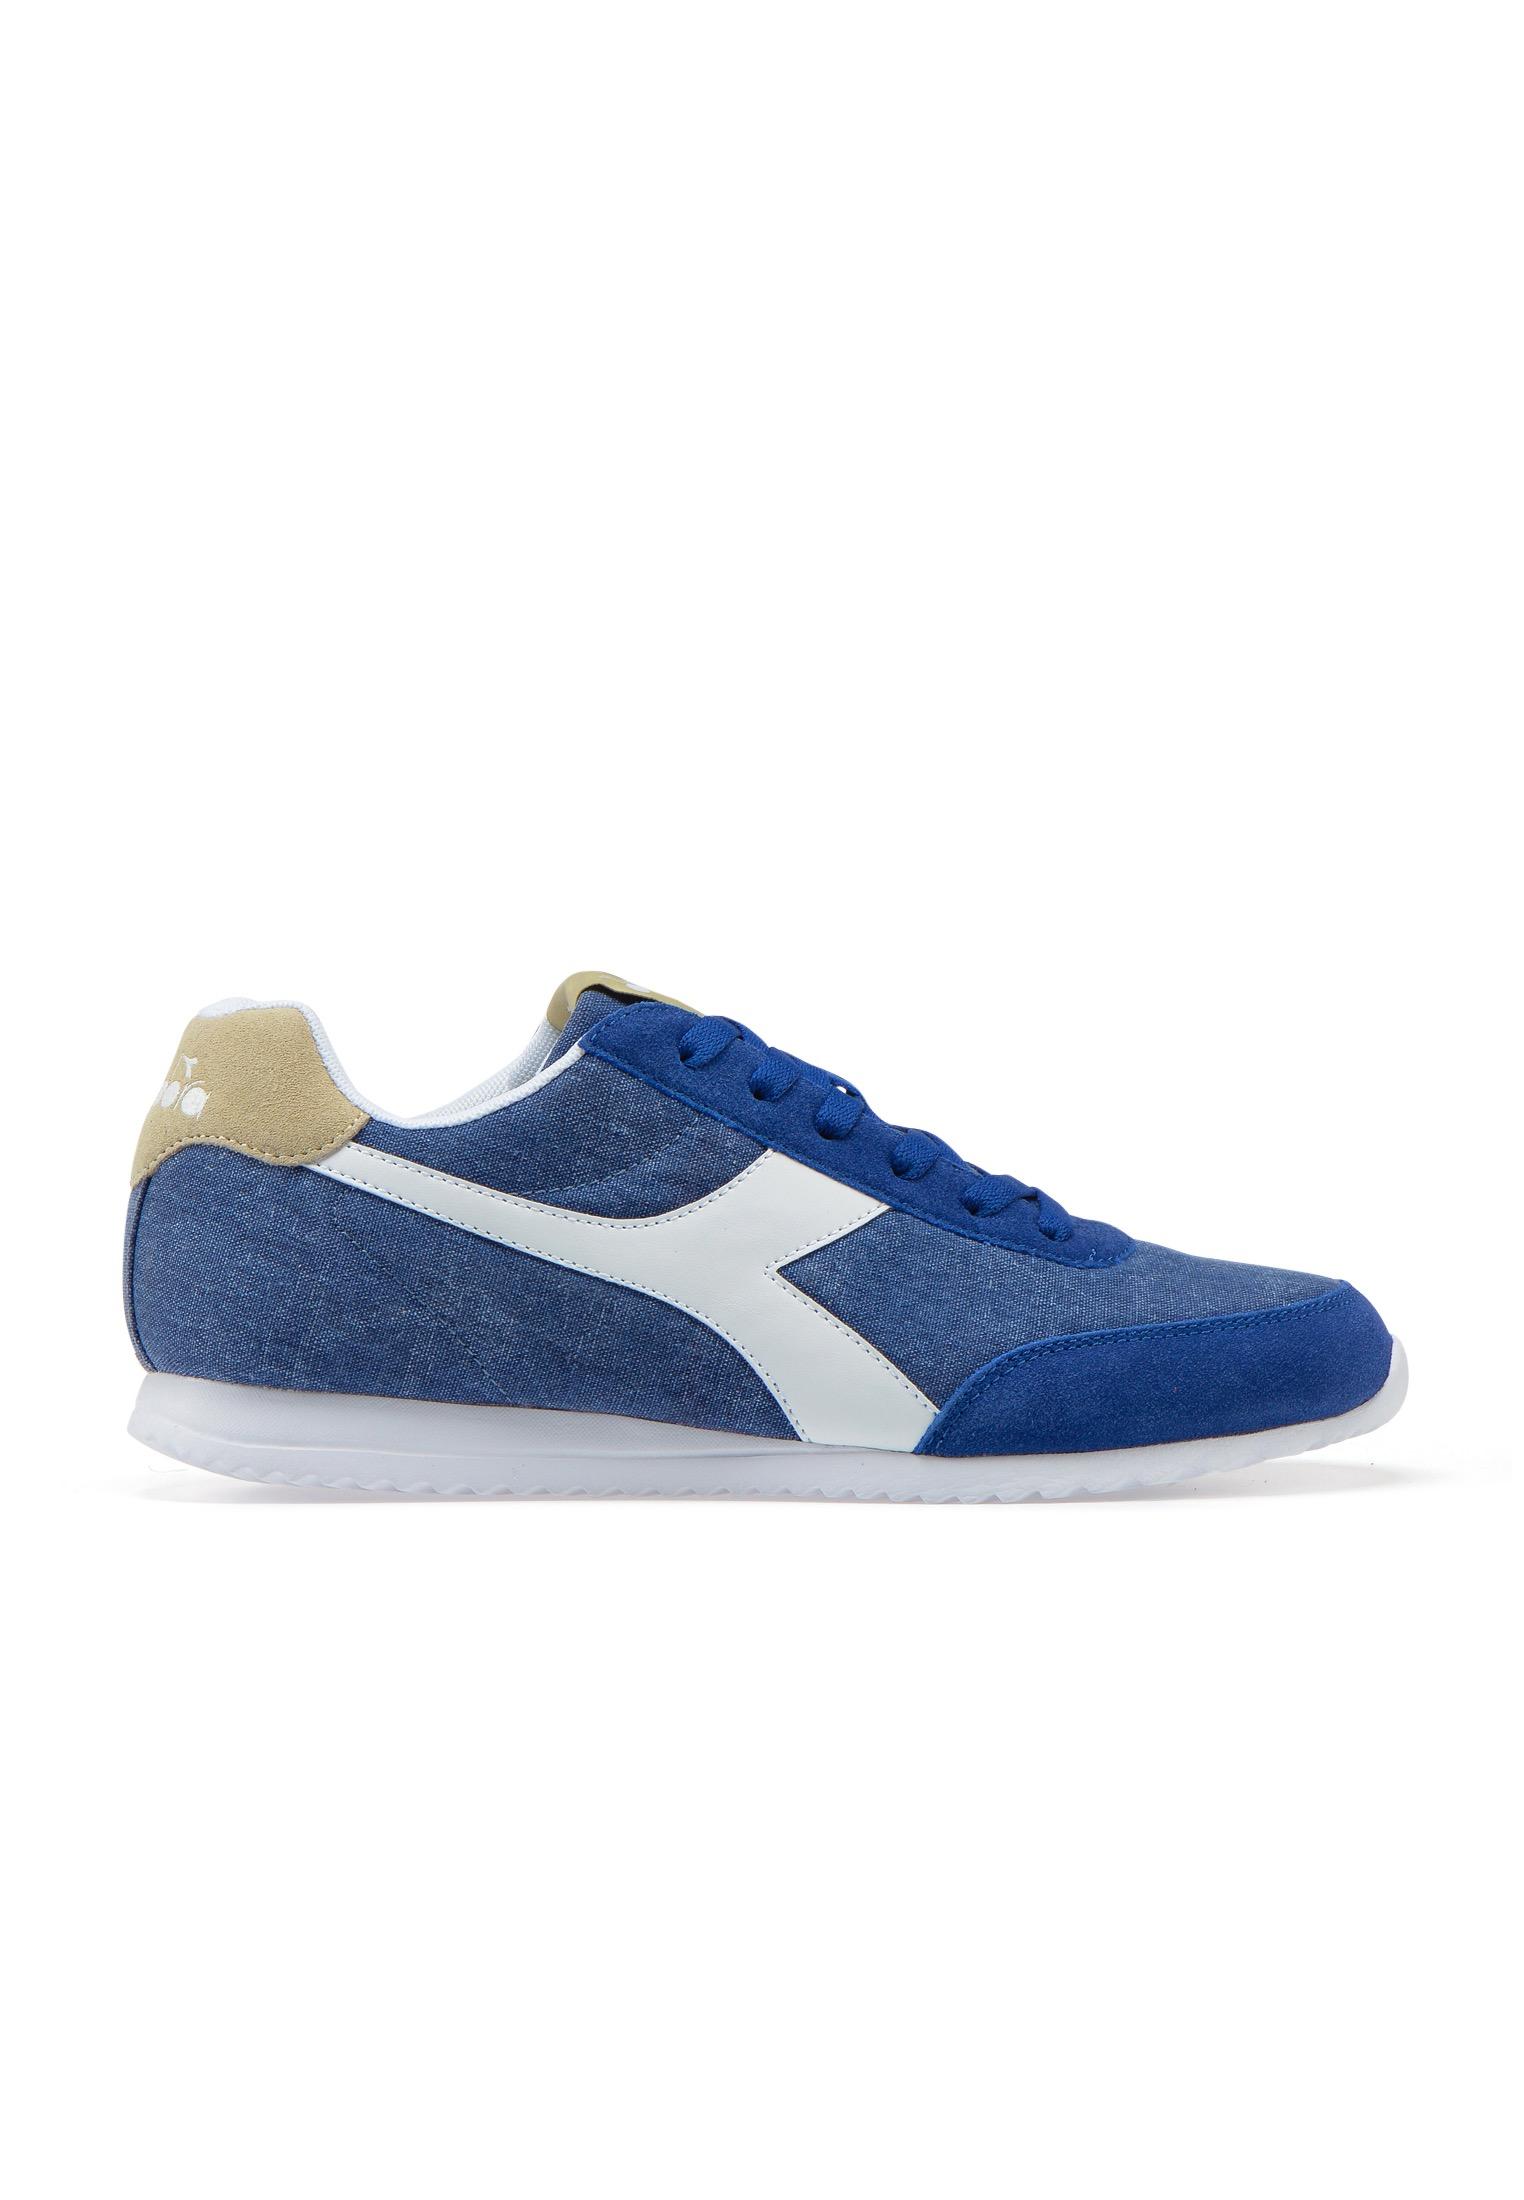 Scarpe-Diadora-Jog-Light-C-Sneakers-sportive-uomo-donna-vari-colori-e-taglie miniatura 15